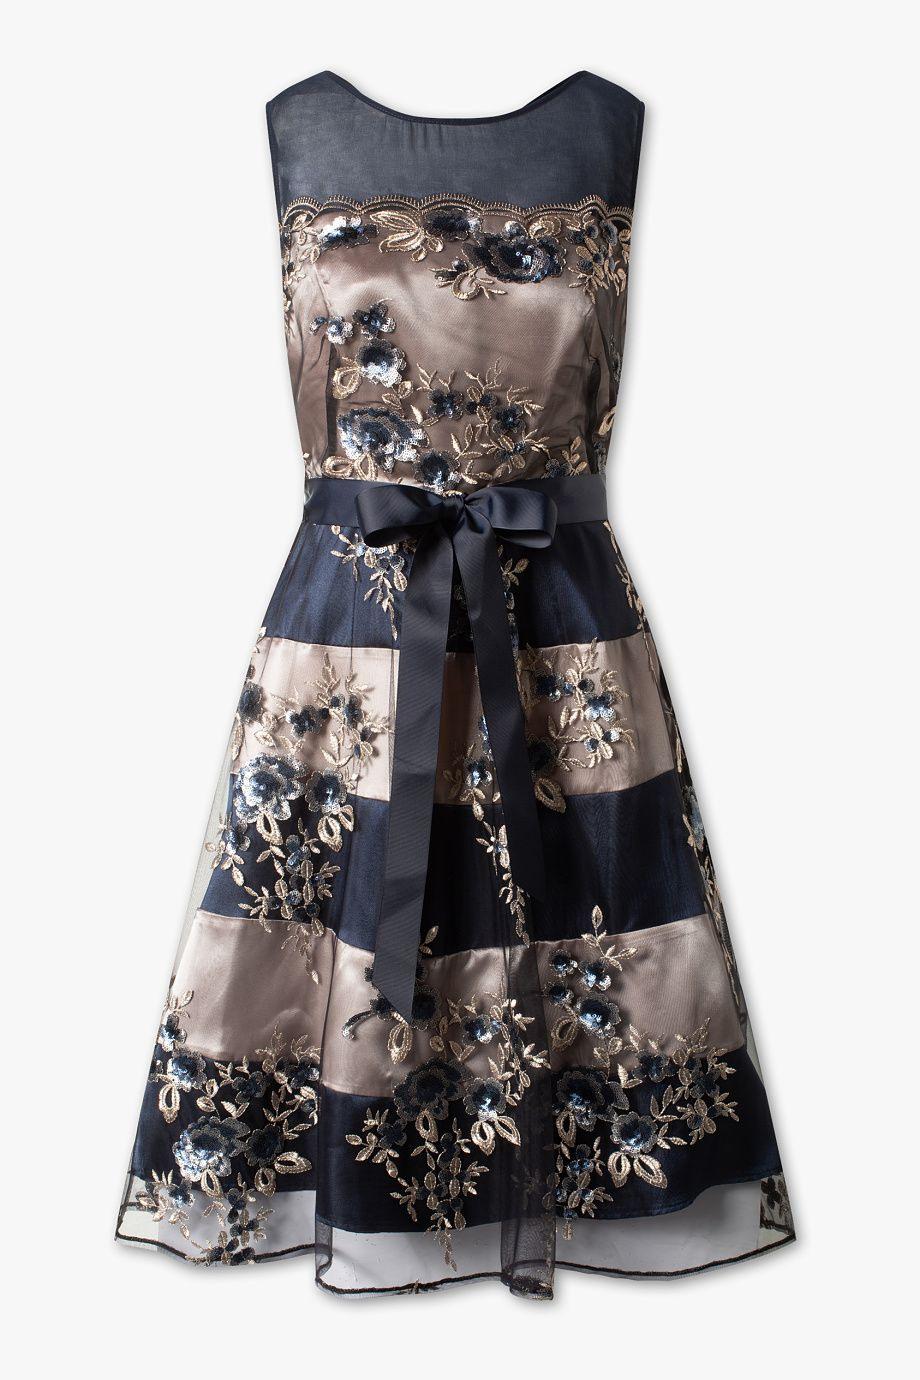 Damen - Fit & Flare Kleid - Festlich - Glanz Effekt - Blau